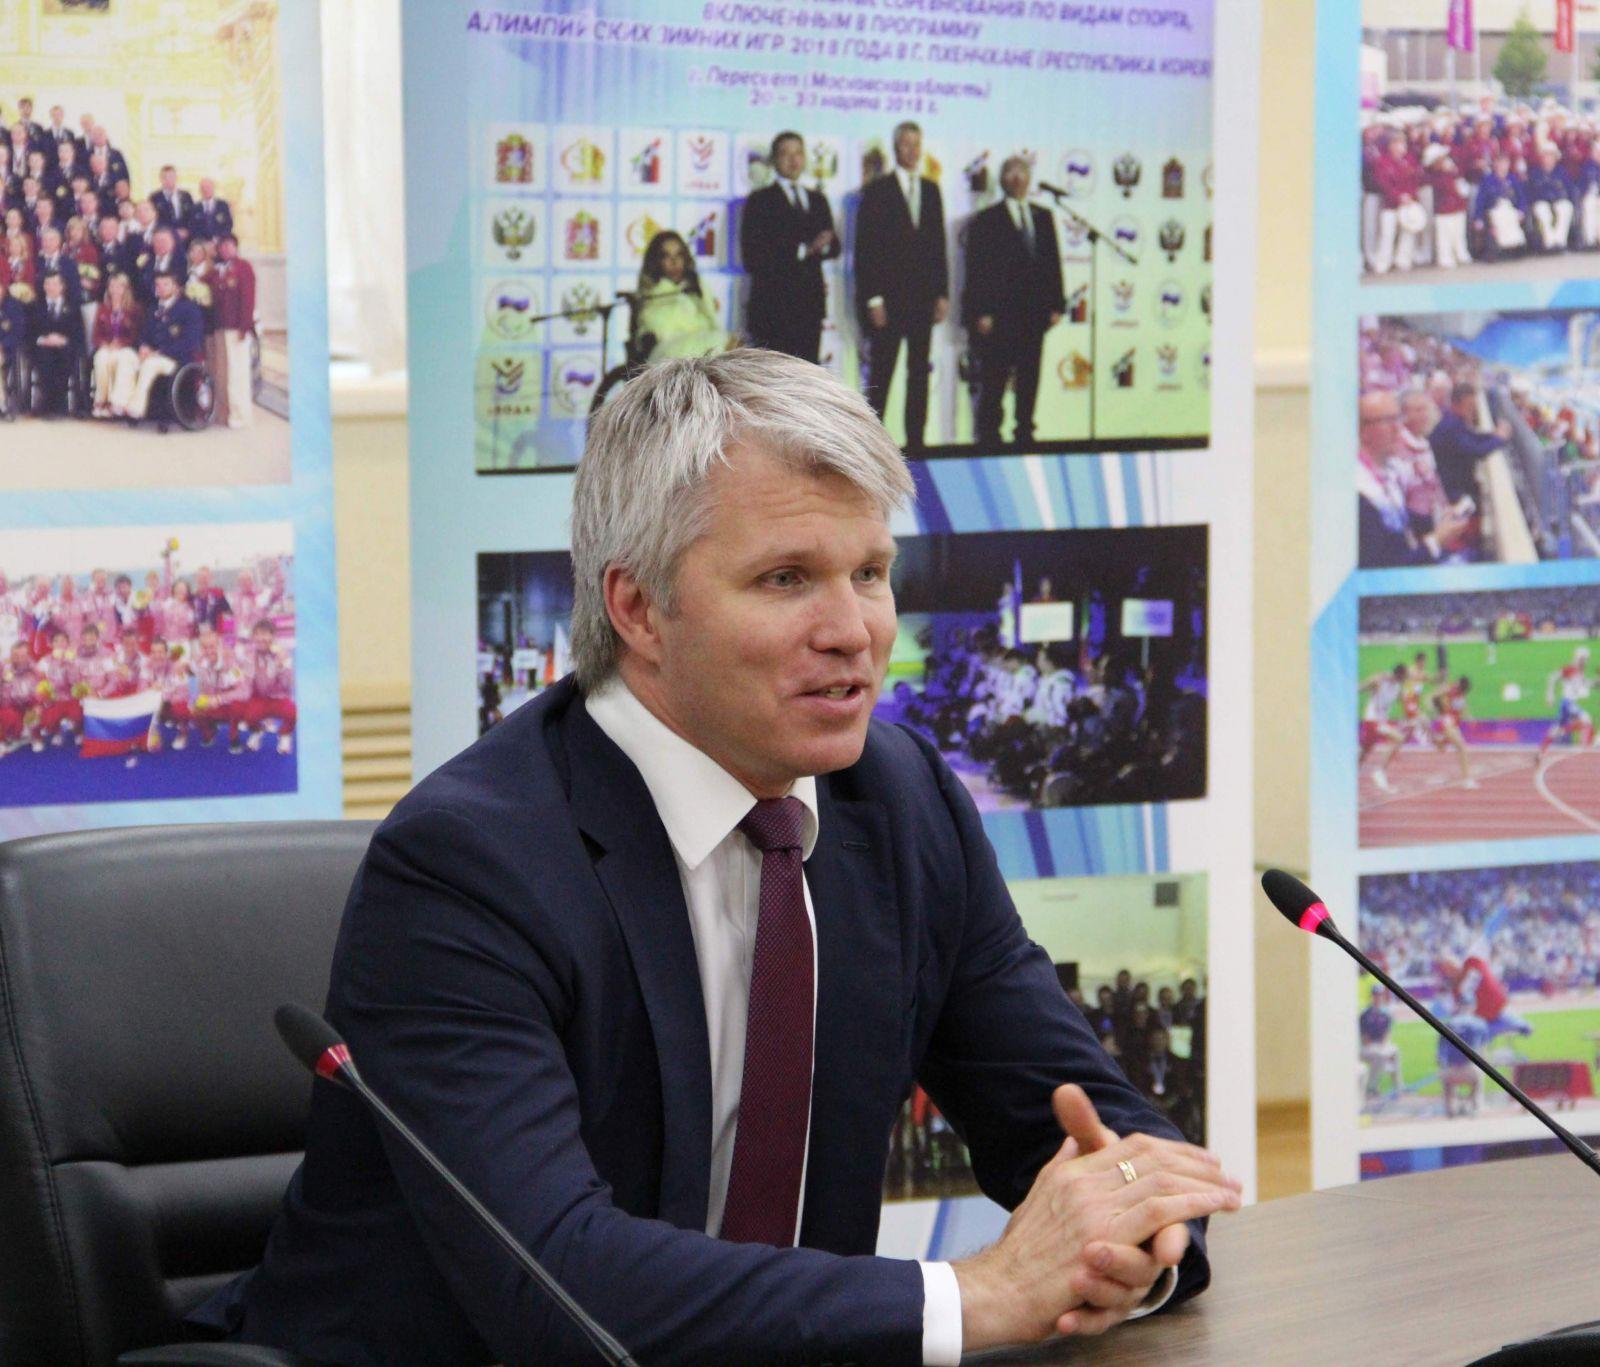 Поздравление президента ПКР В.П. Лукина Министру спорта Российской Федерации П.А. Колобкову в связи с Юбилеем